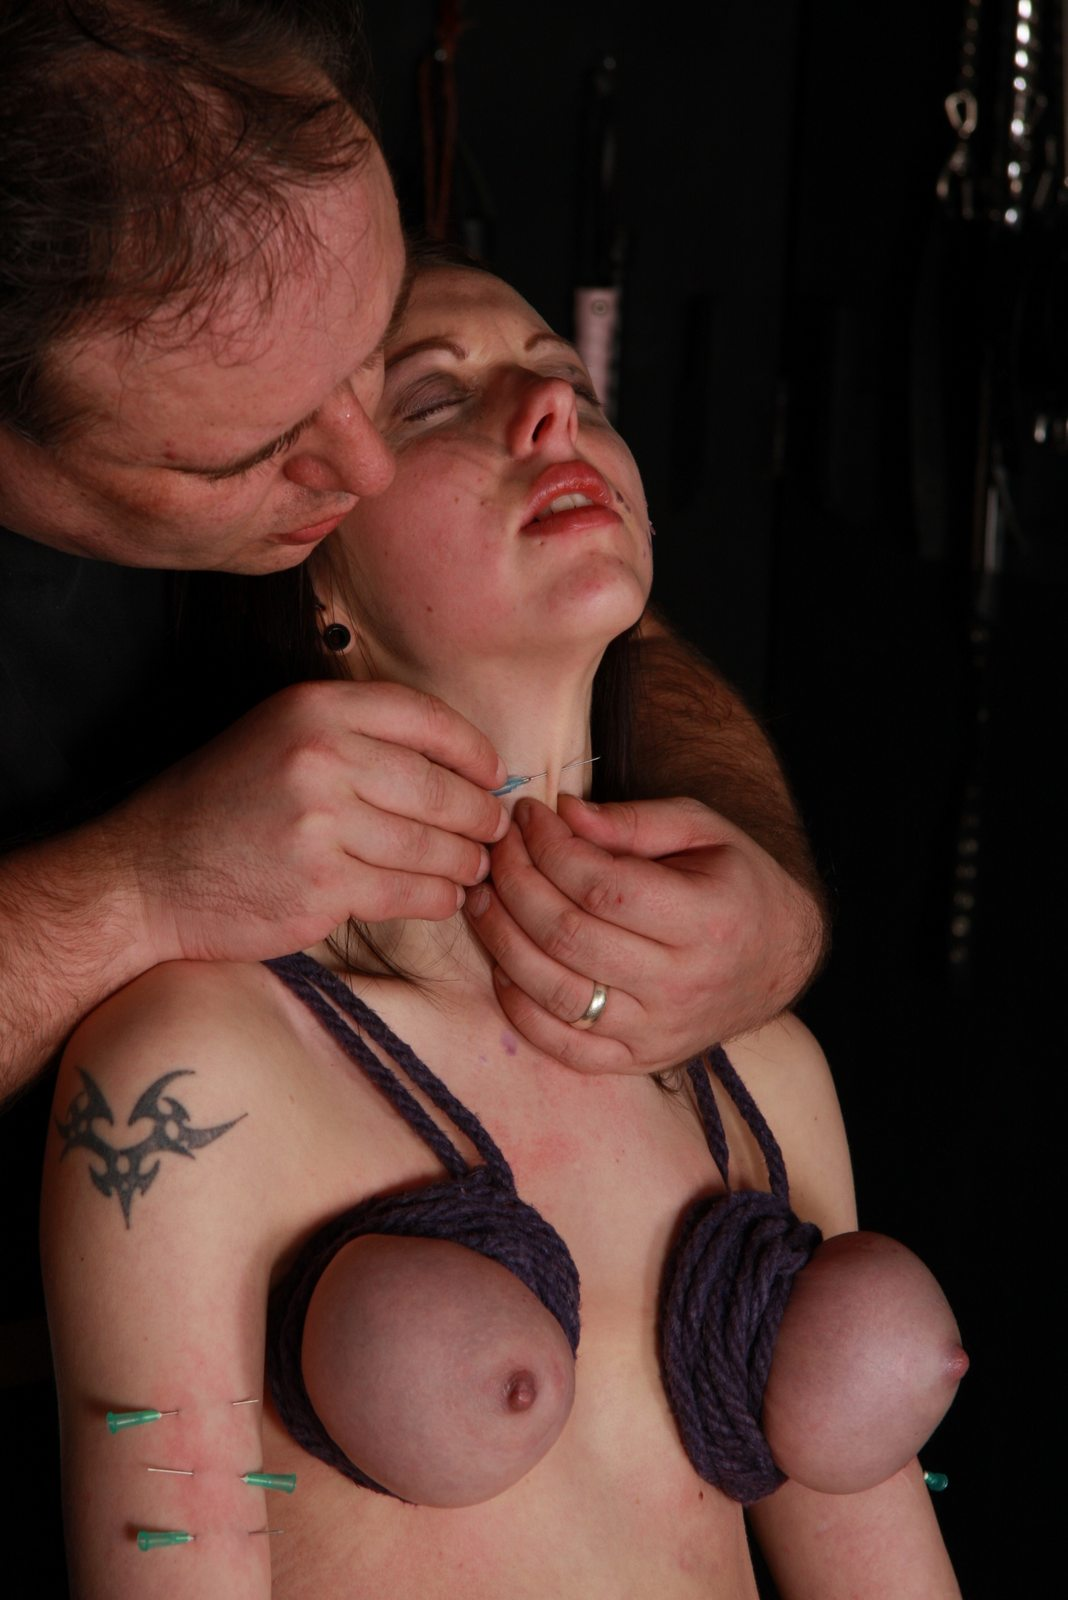 Day, purpose Bdsm tortured tits needles